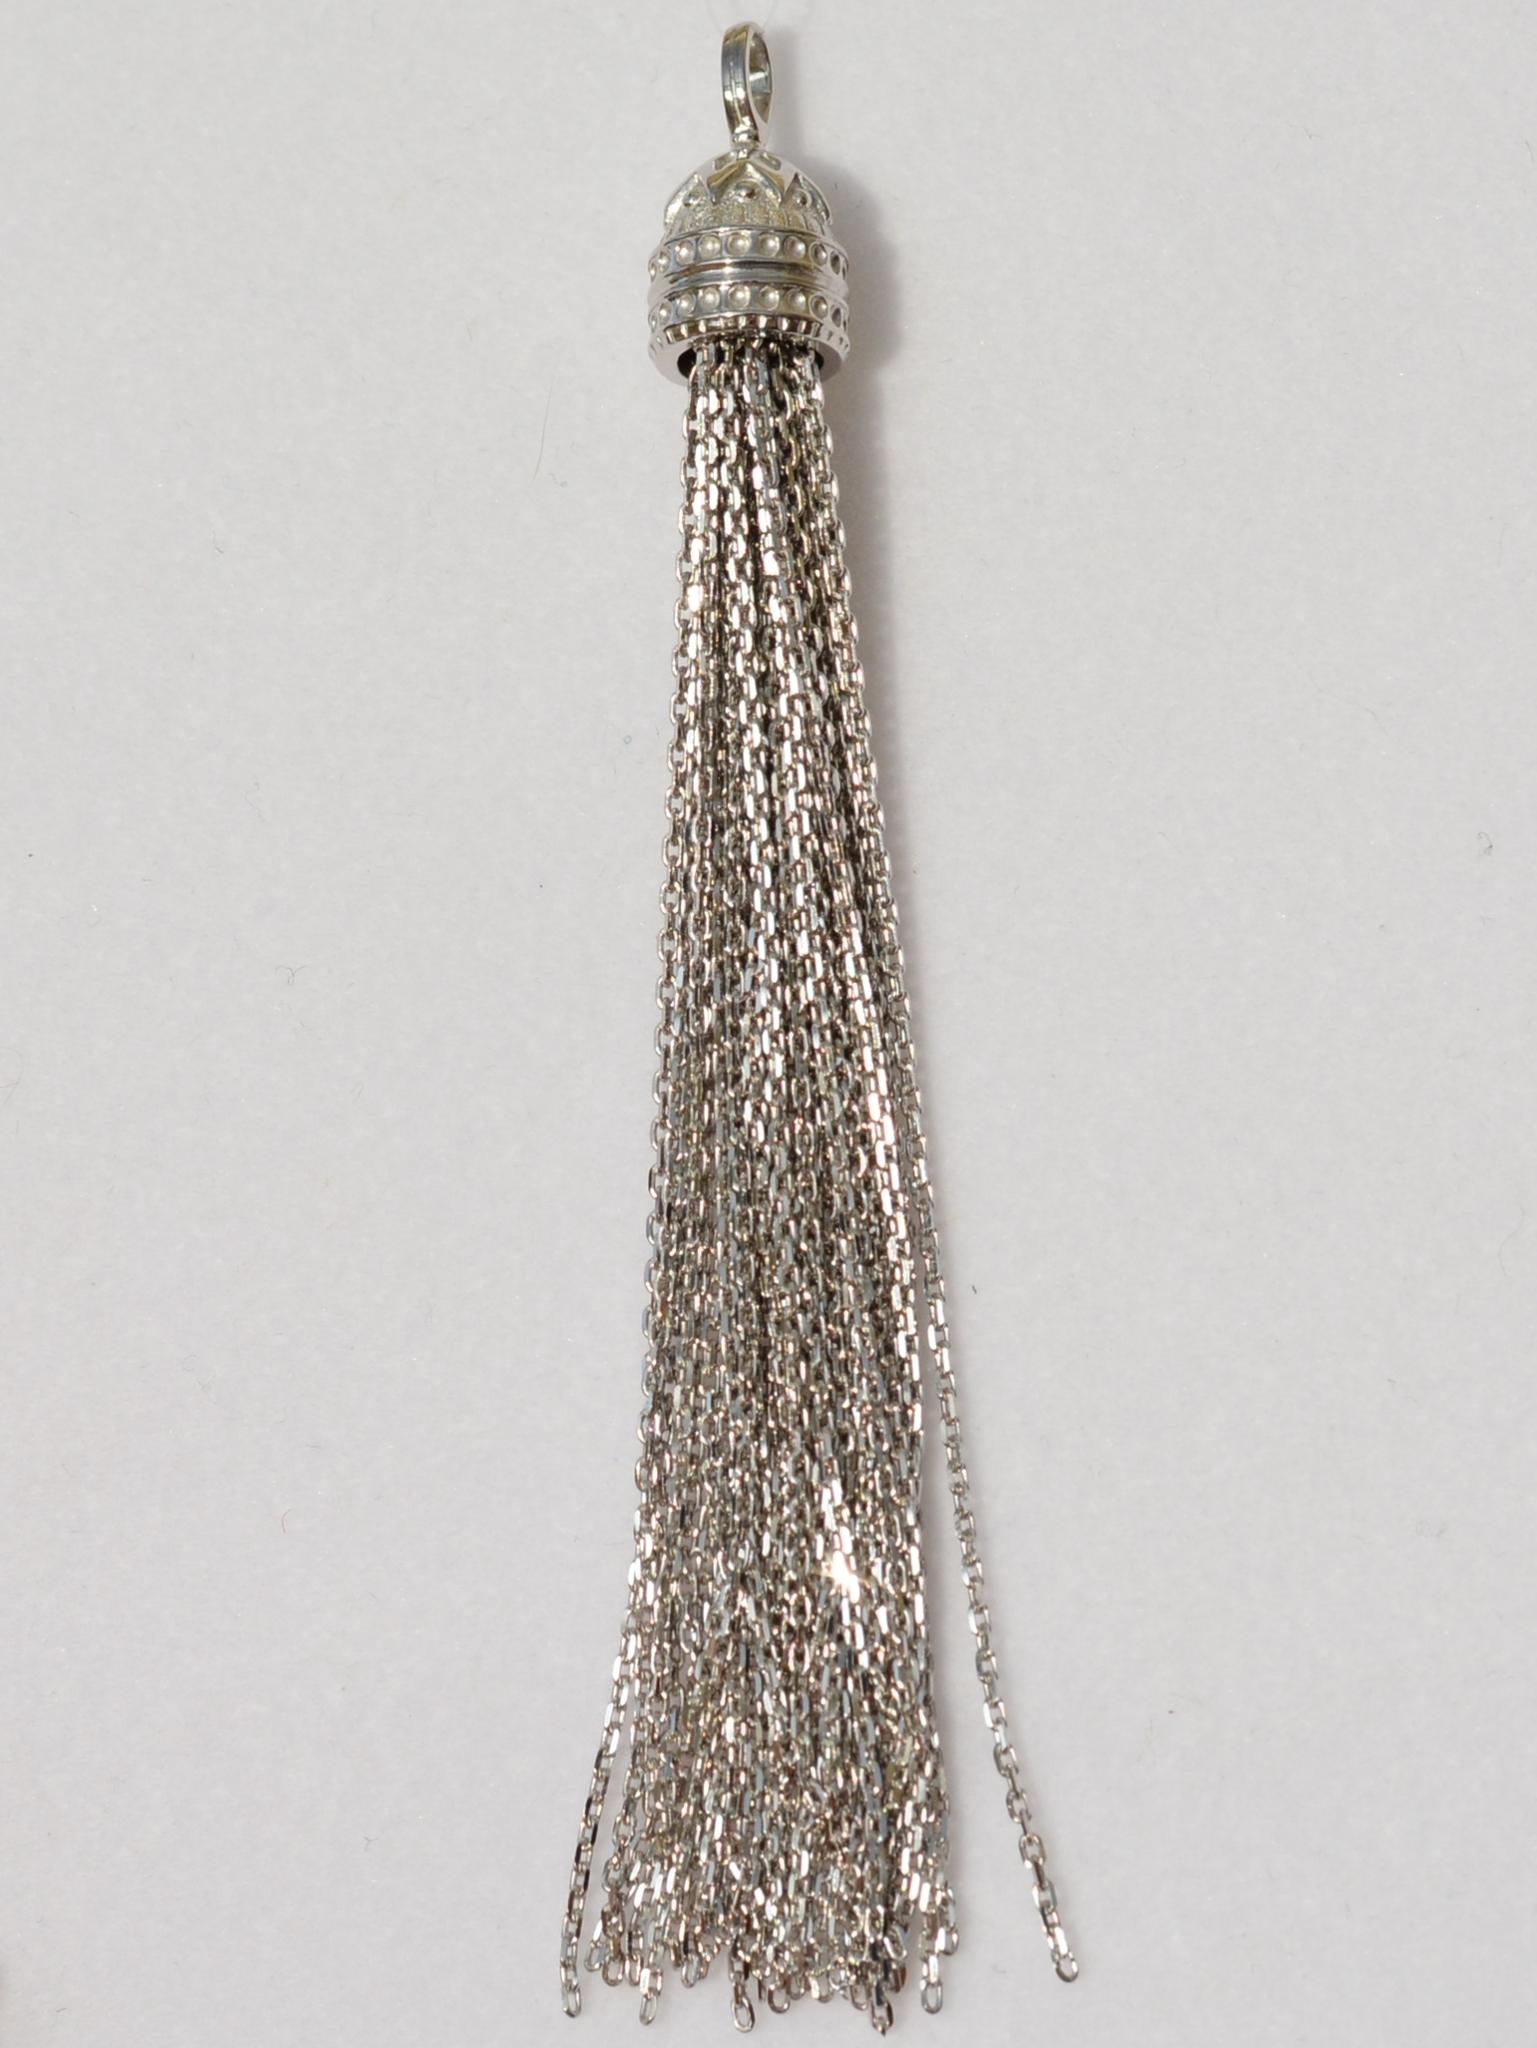 0420616 (серебряный кулон)